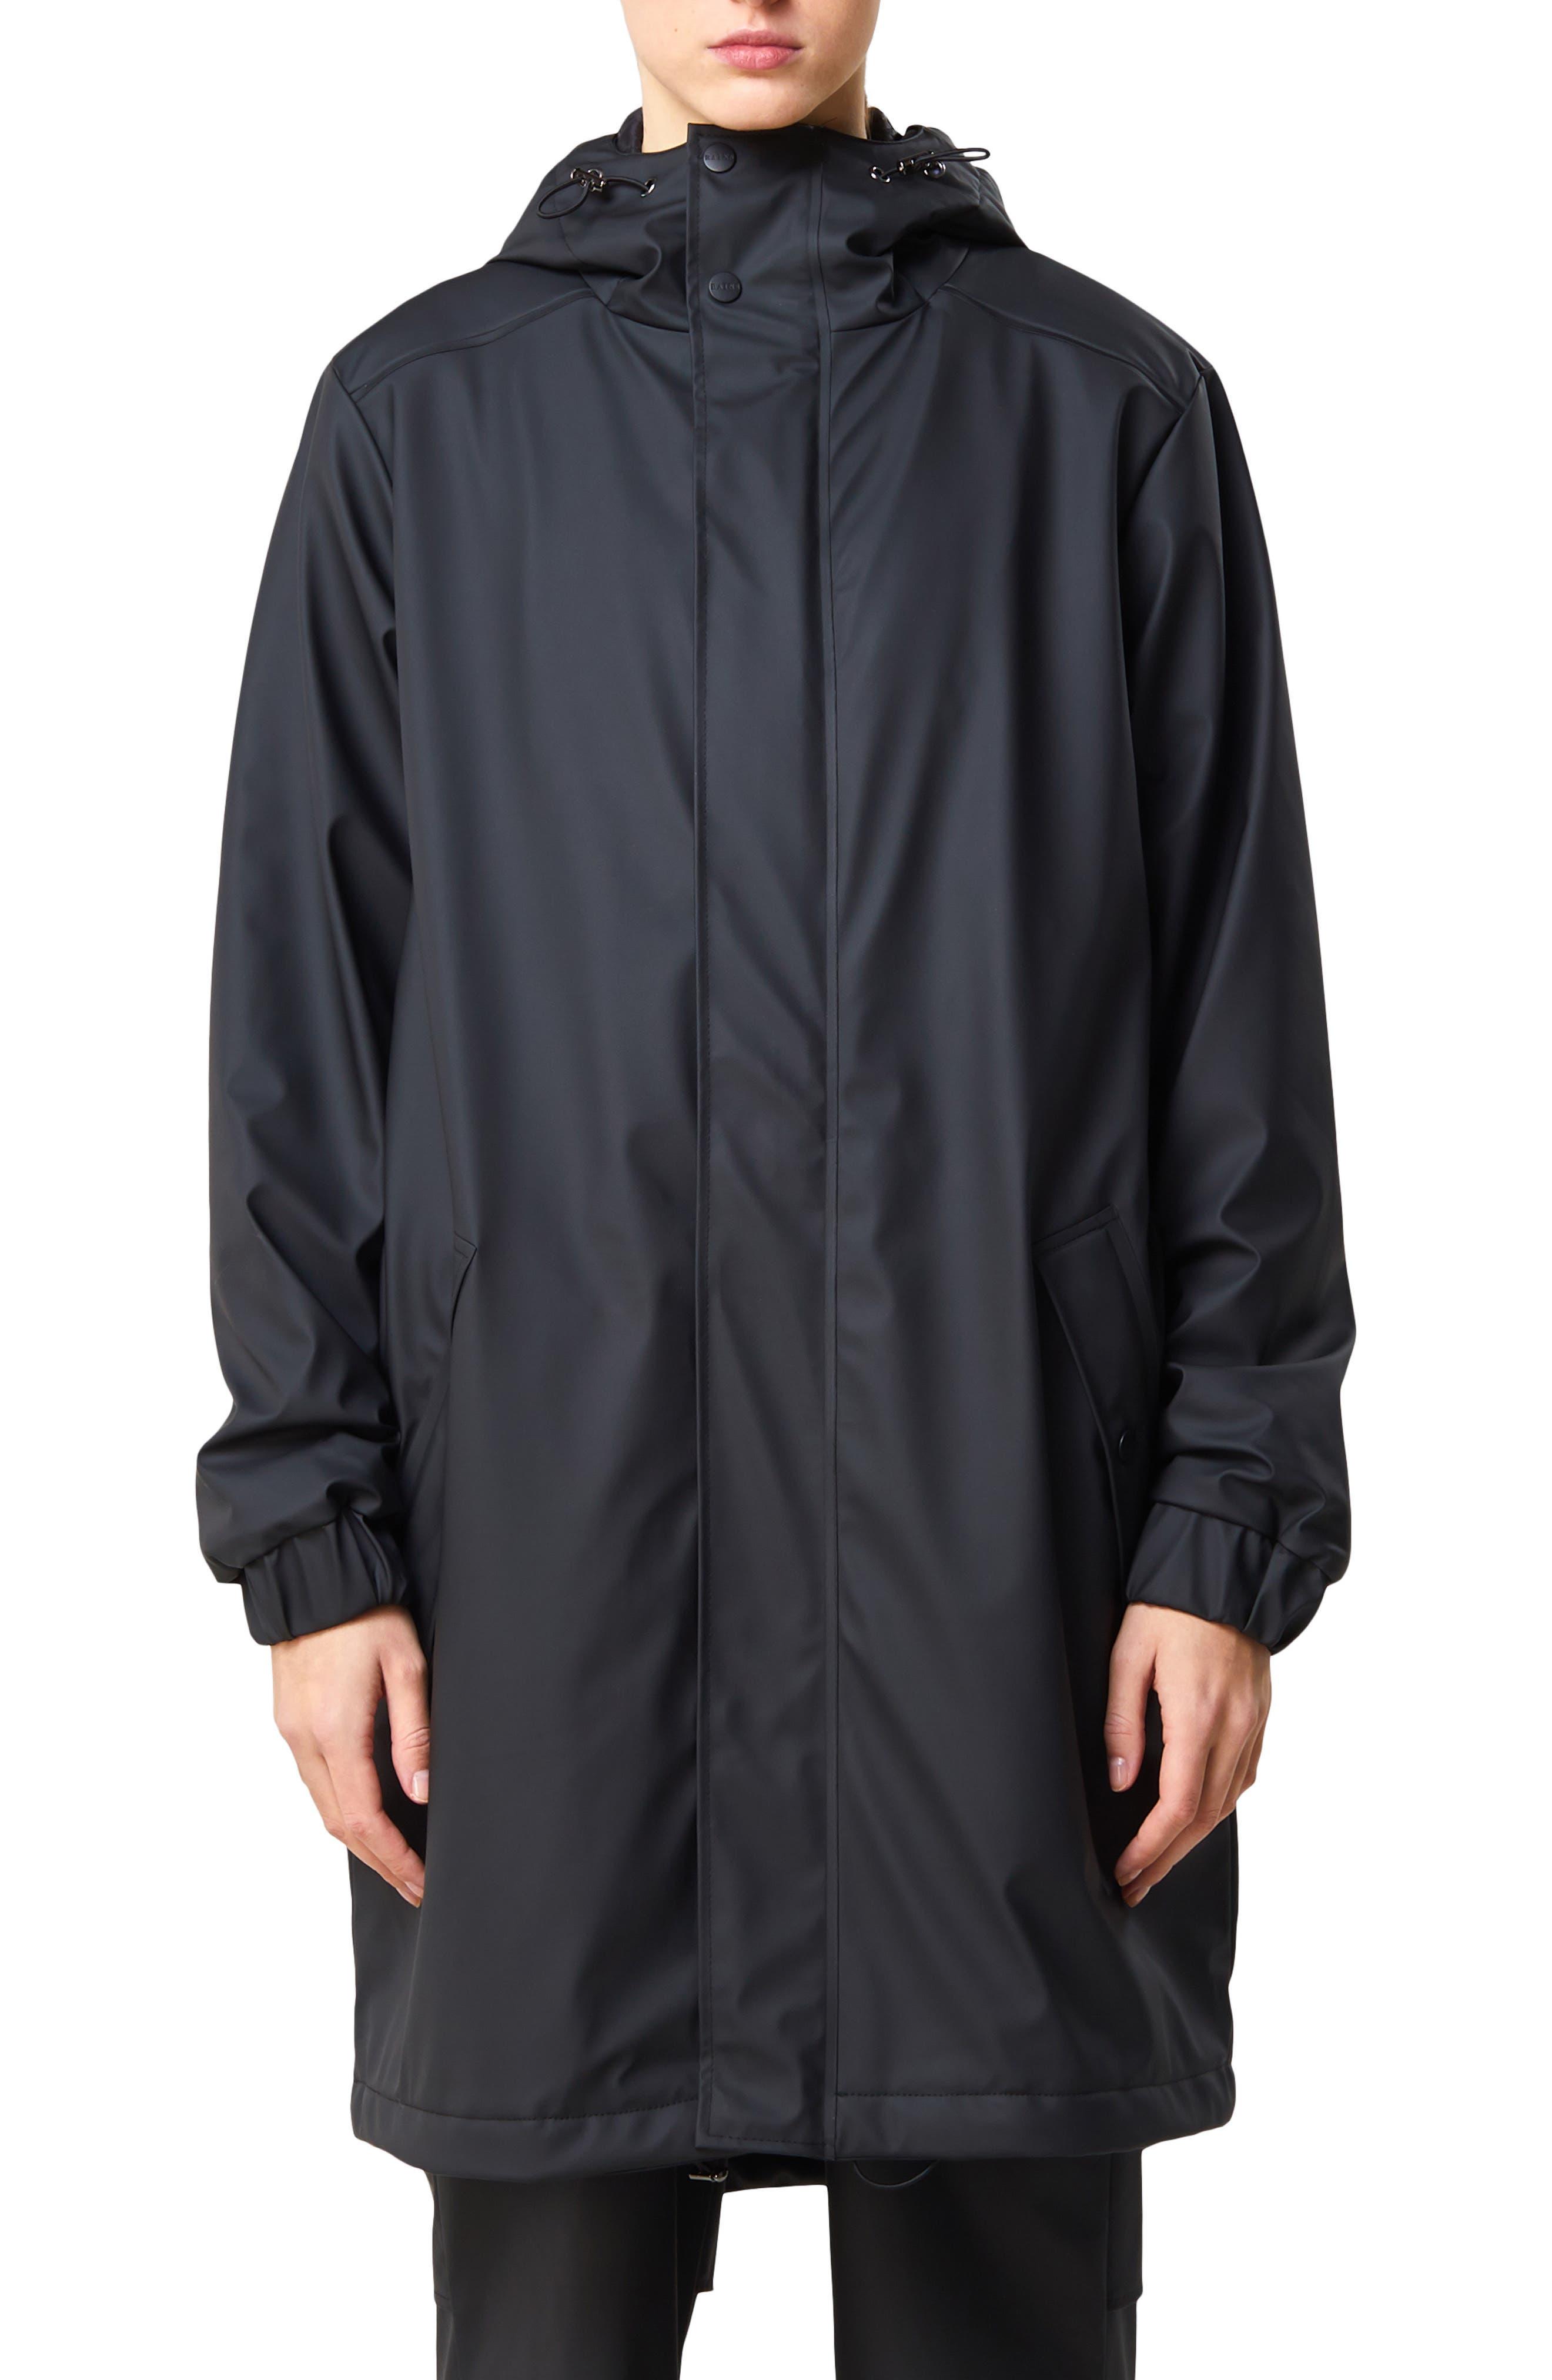 Image of Rains Waterproof Hooded Quilted Jacket